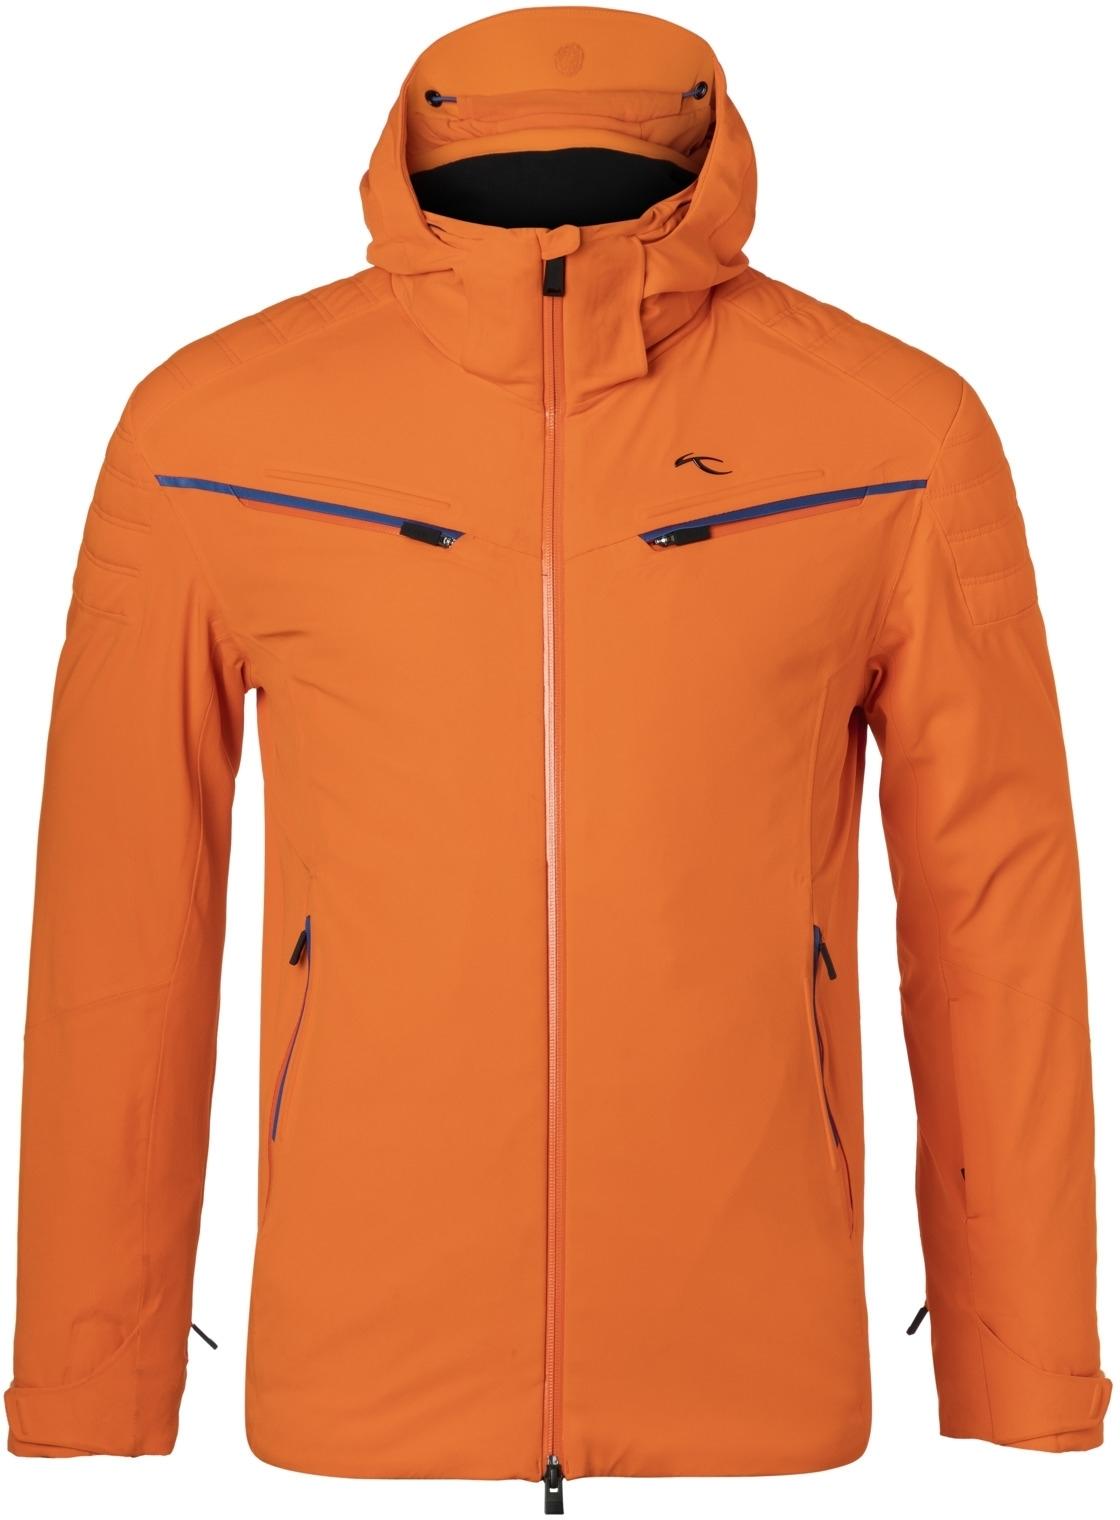 Pánská lyžařská bunda Kjus Men Formula Jacket - Kjus orange - Ski a ... c6ba6a6d48